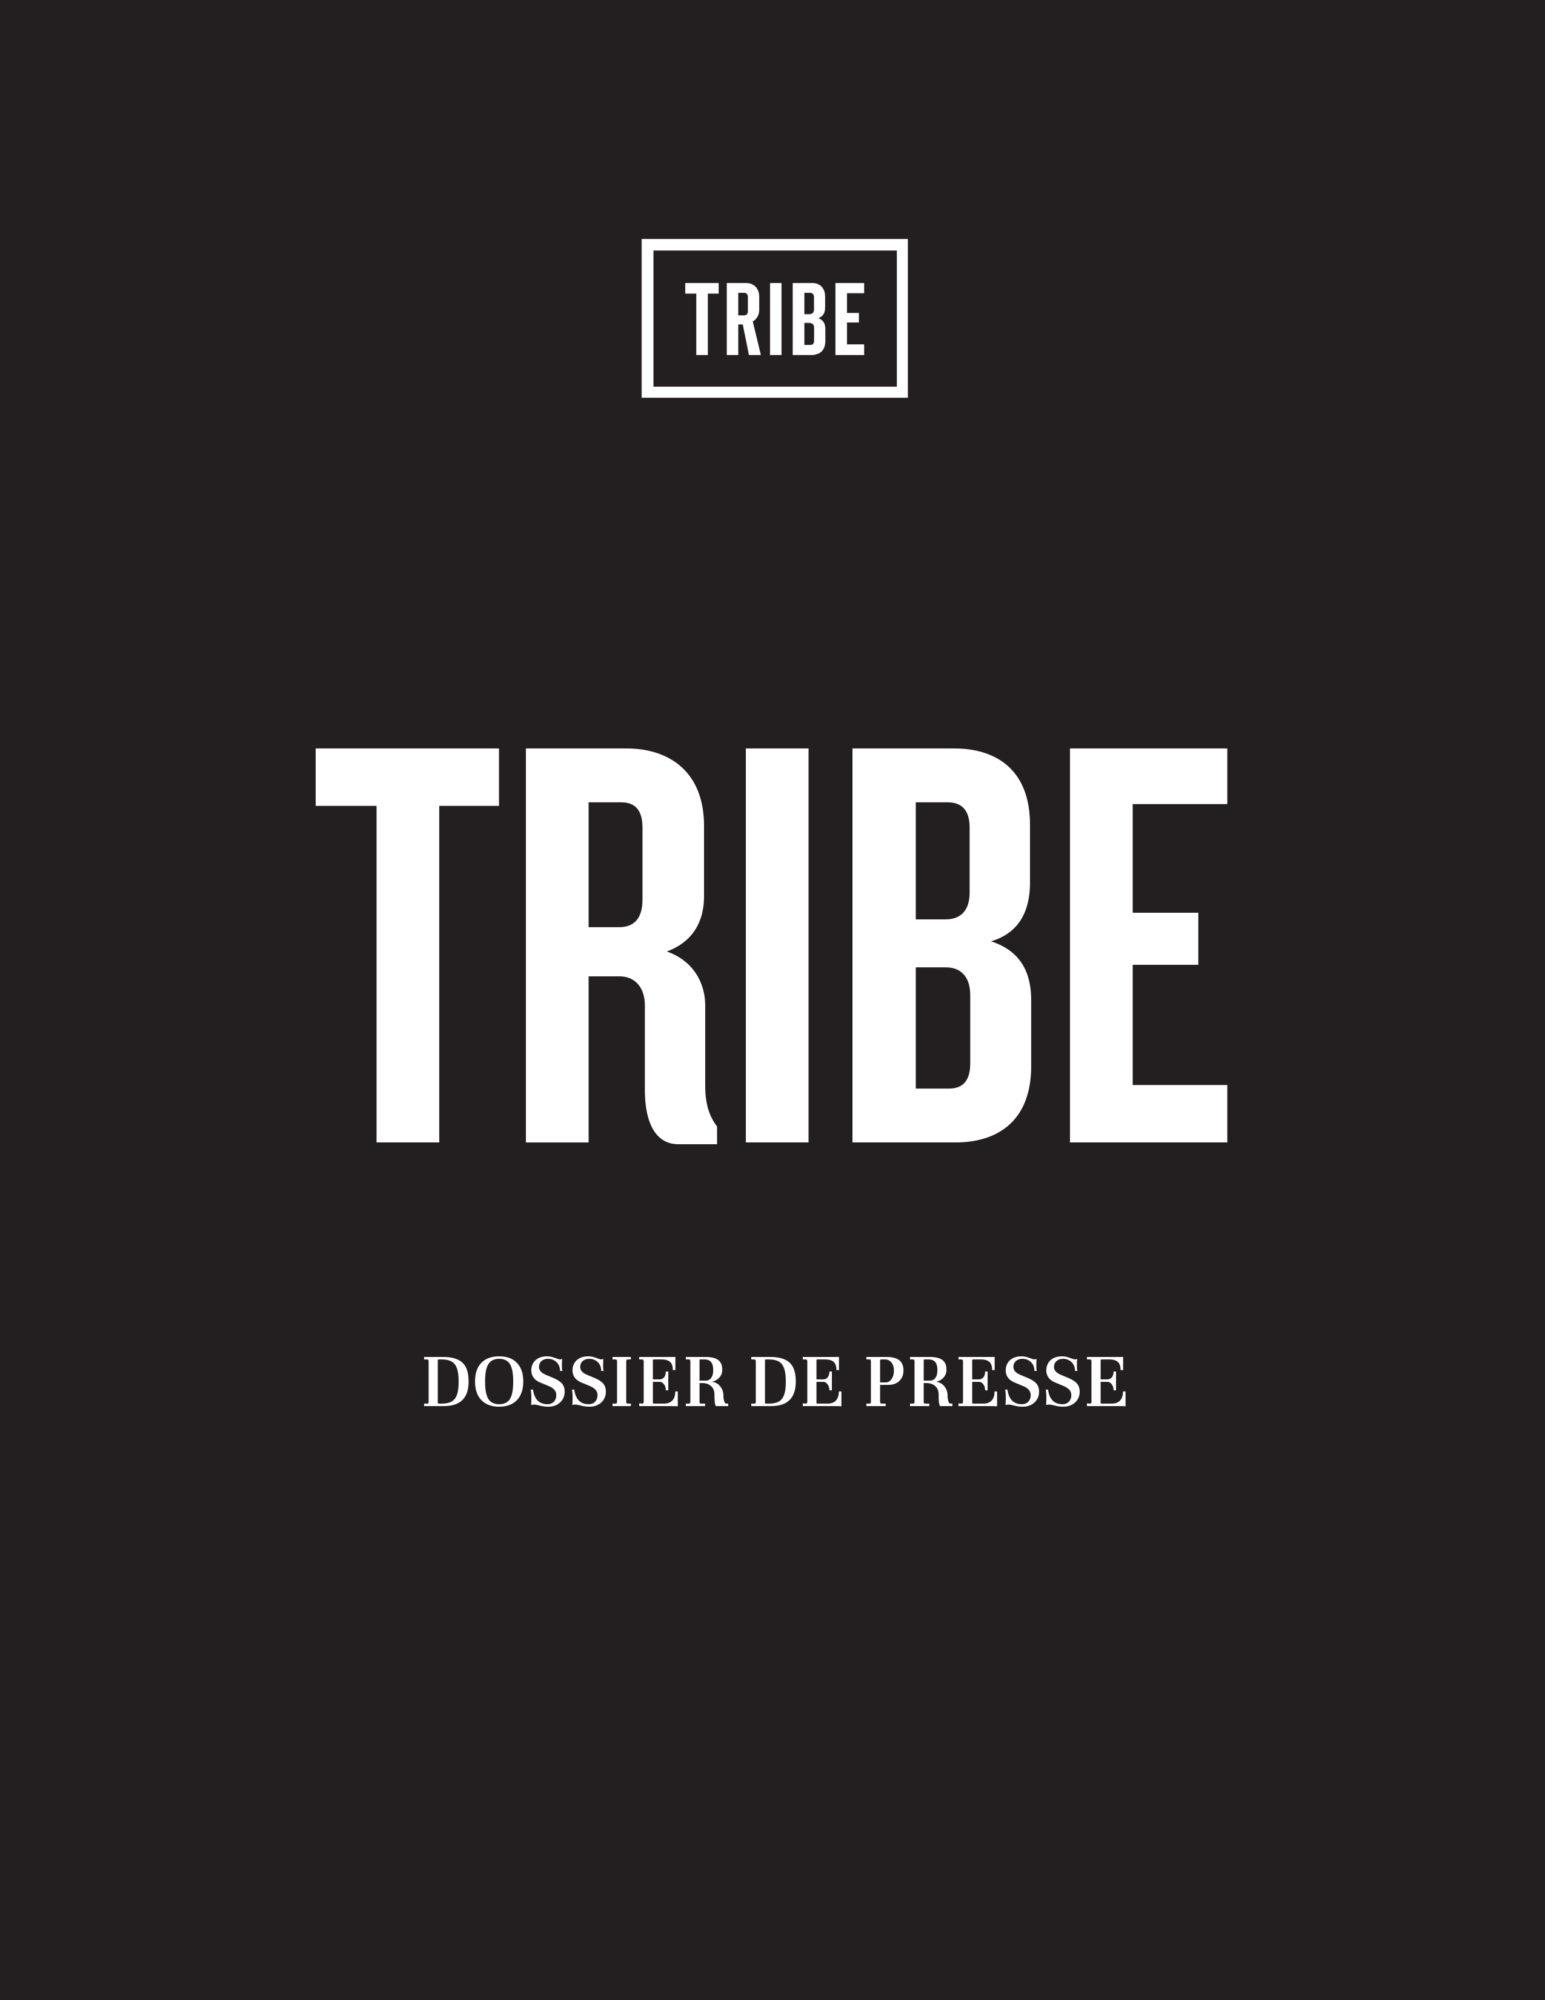 TRIBE Dossier de presse - Juillet 2020